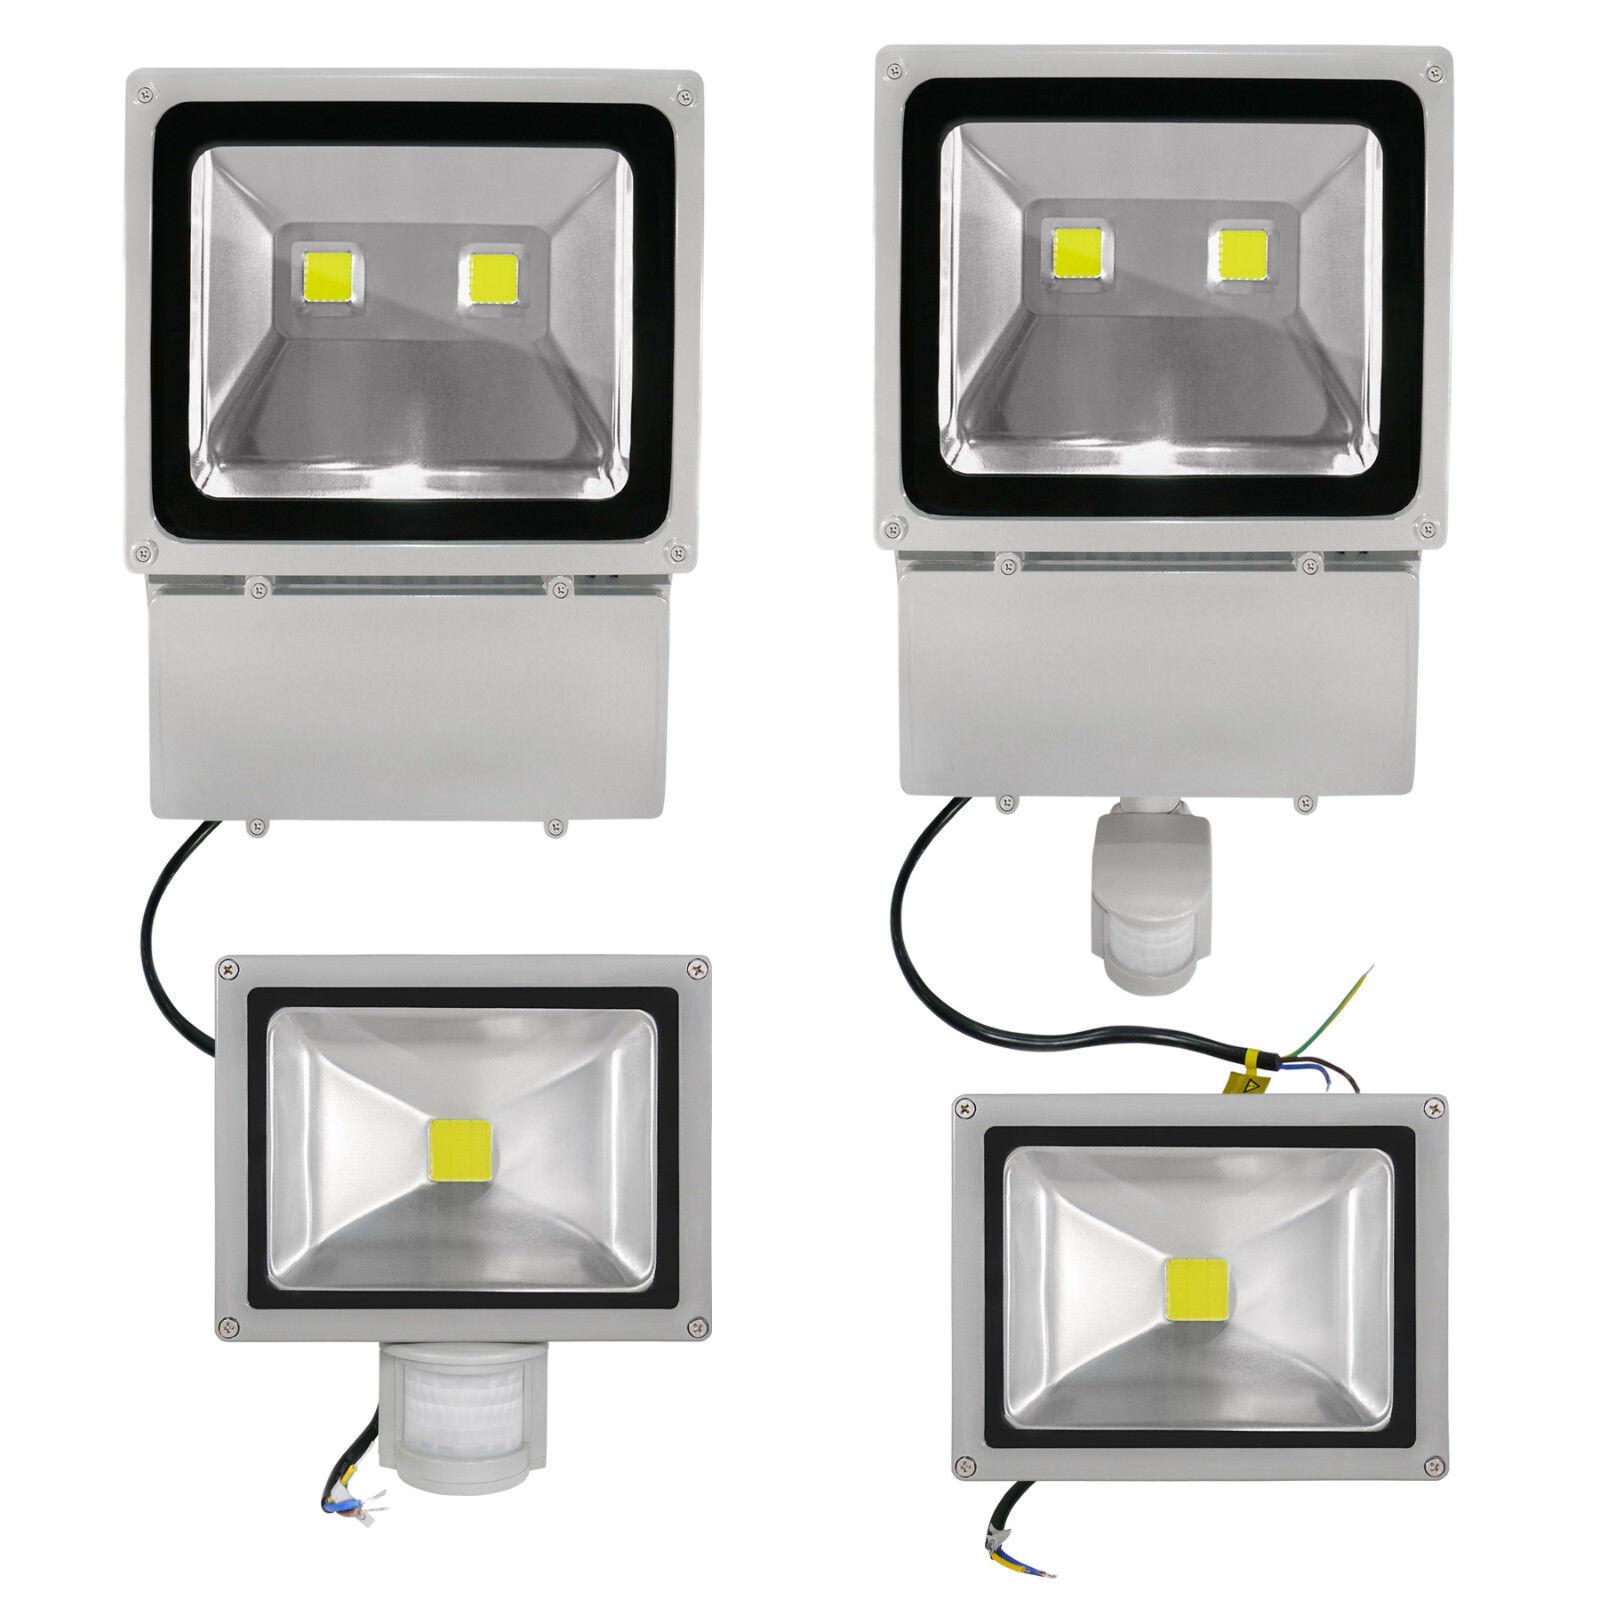 Cob LED Proyector Foco de Exterior LED LED Foco blancoo Frío con sin 180° Bm